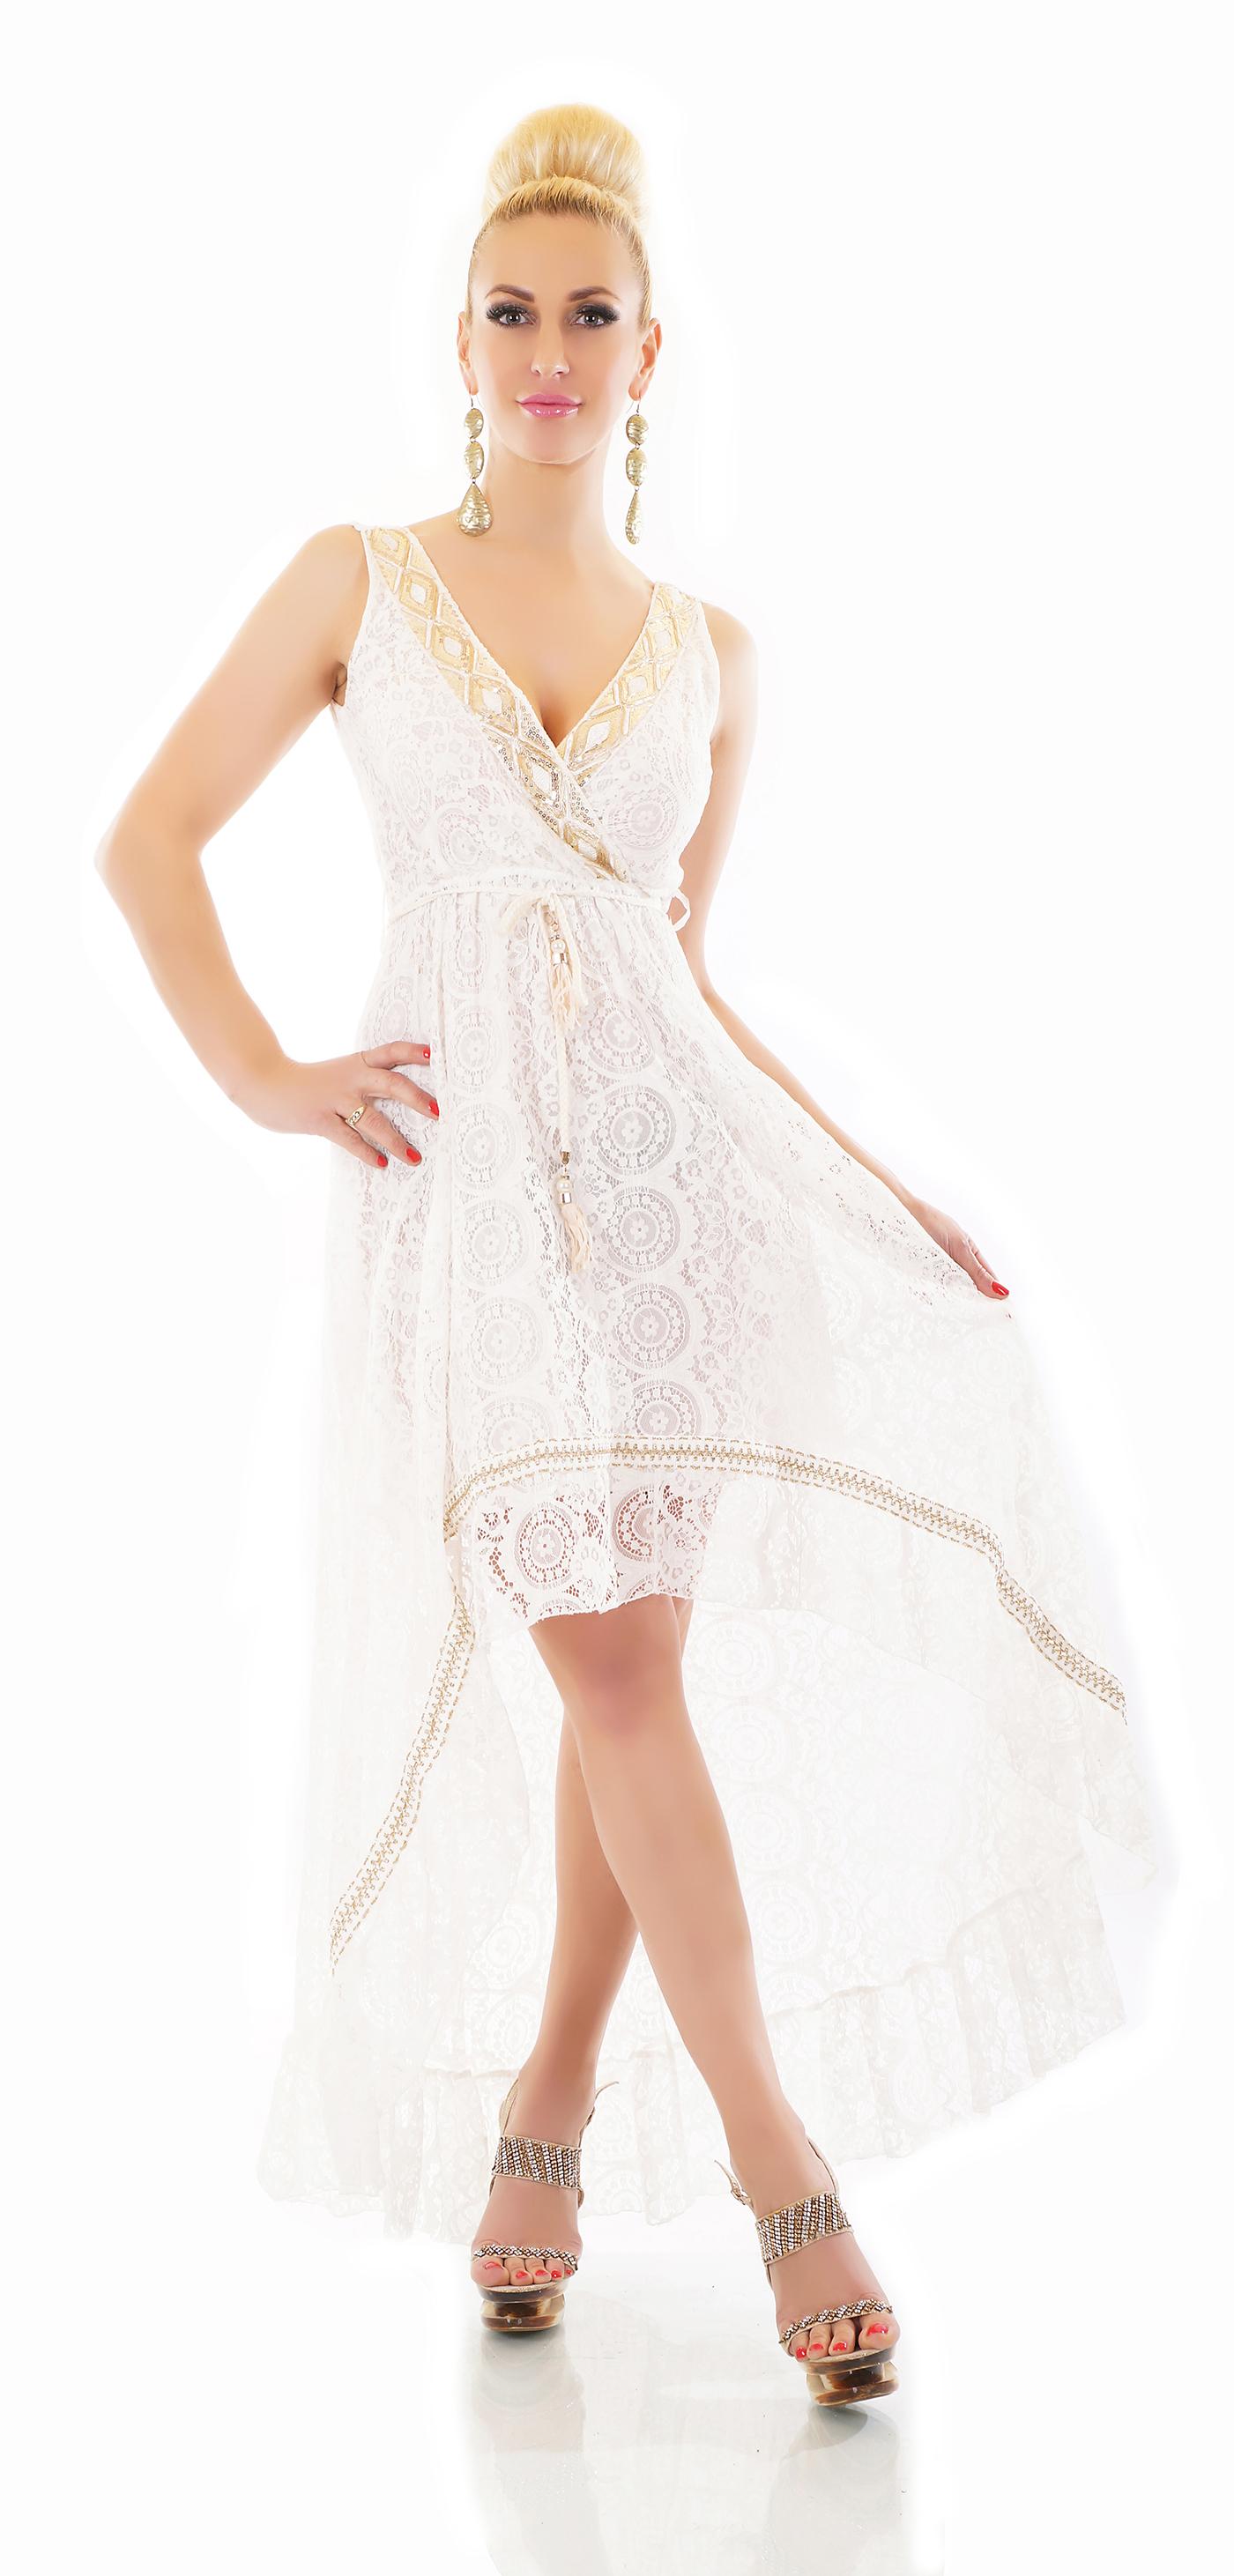 Trendstylez - Vokuhila Kleid aus Spitze